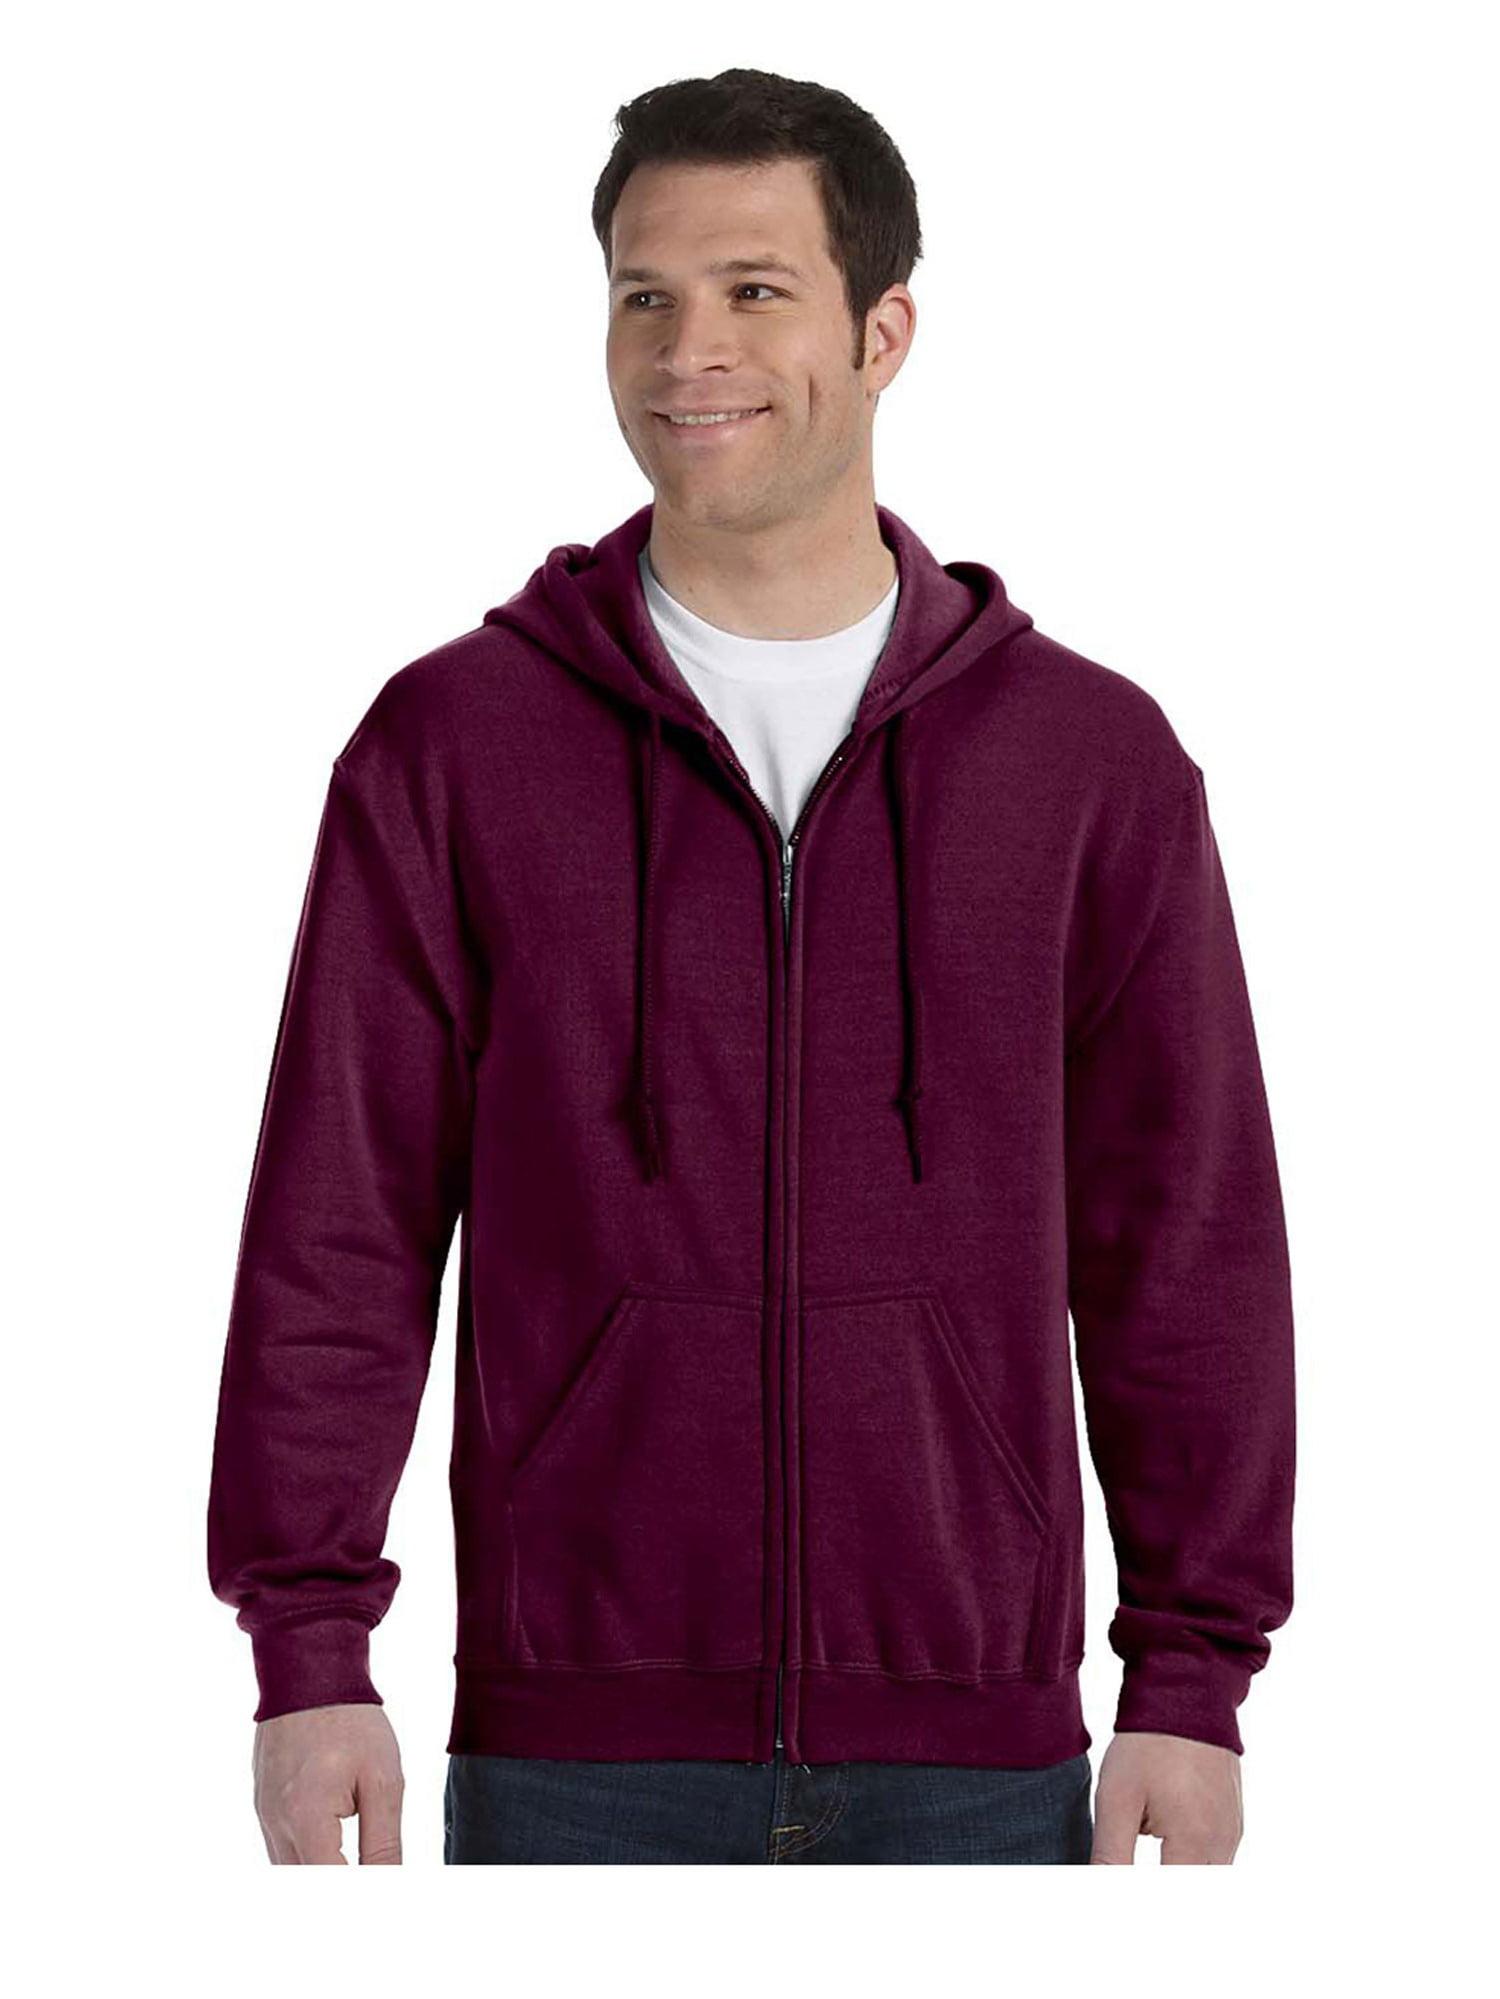 Gildan Men's Satin Label 1x1 Rib Zipper Pouch Pocket Hoodie, Style G18600